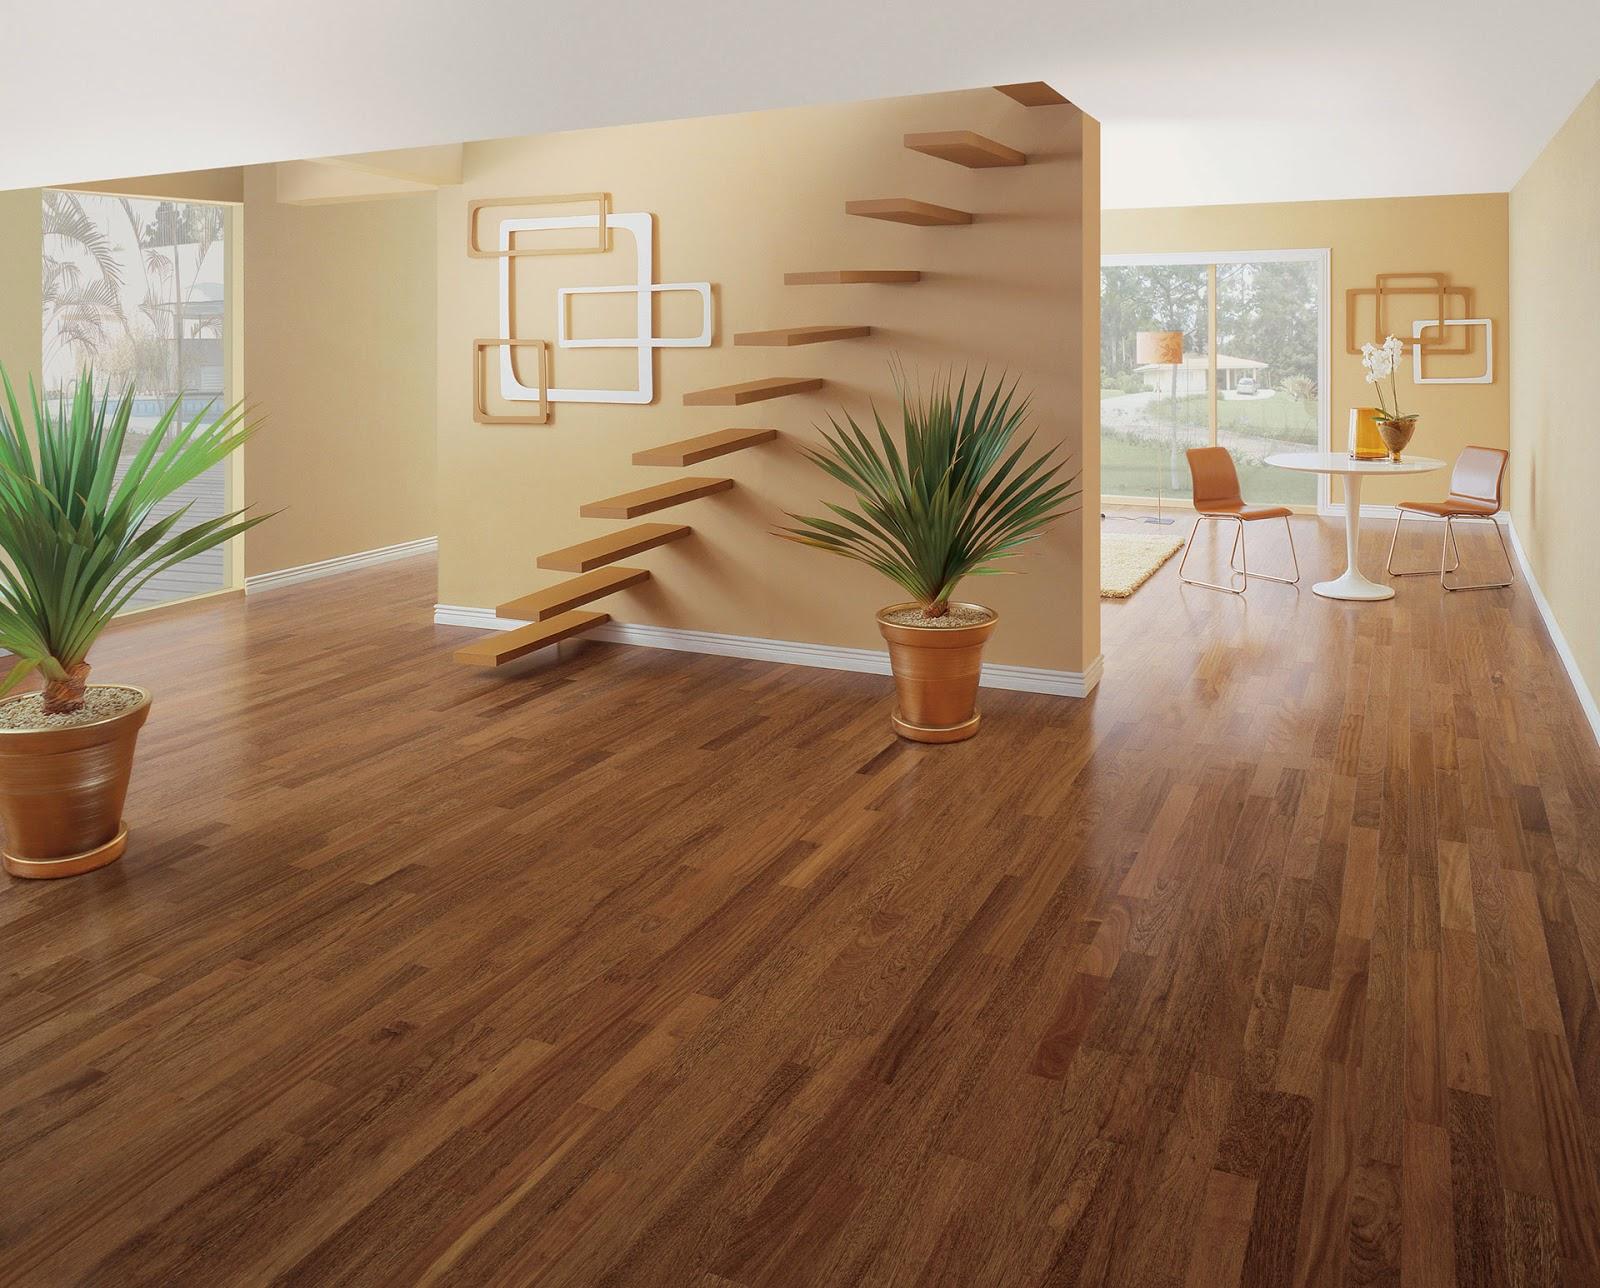 Pisos laminados mexico d f piso laminado tonos madera - Tipos de suelos laminados ...